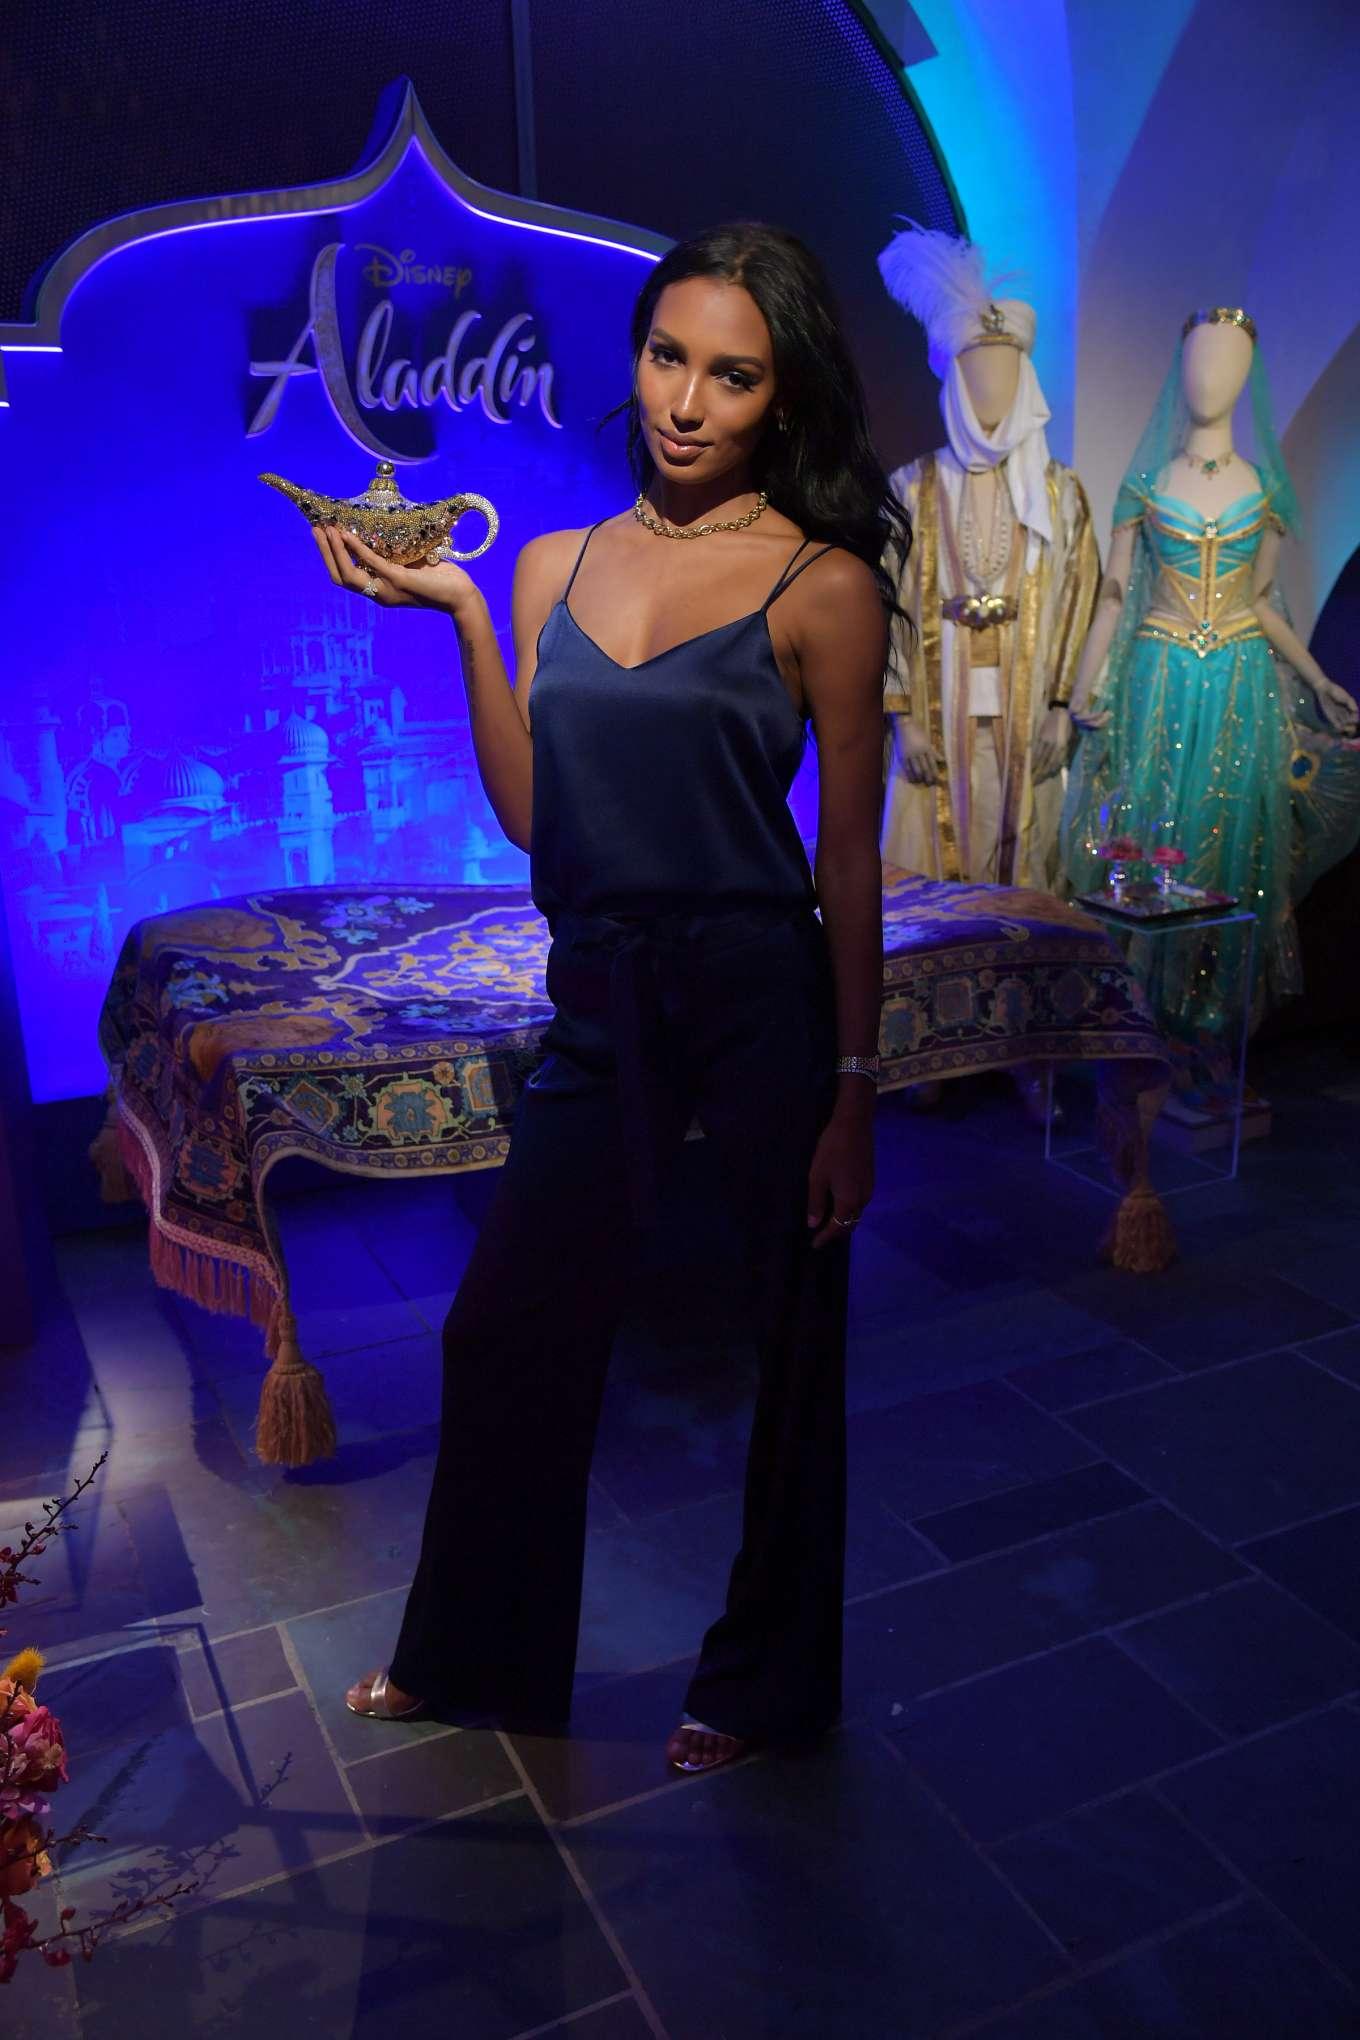 Jasmine Tookes 2019 : Jasmine Tookes: Disneys live action Aladdin product celebration -02